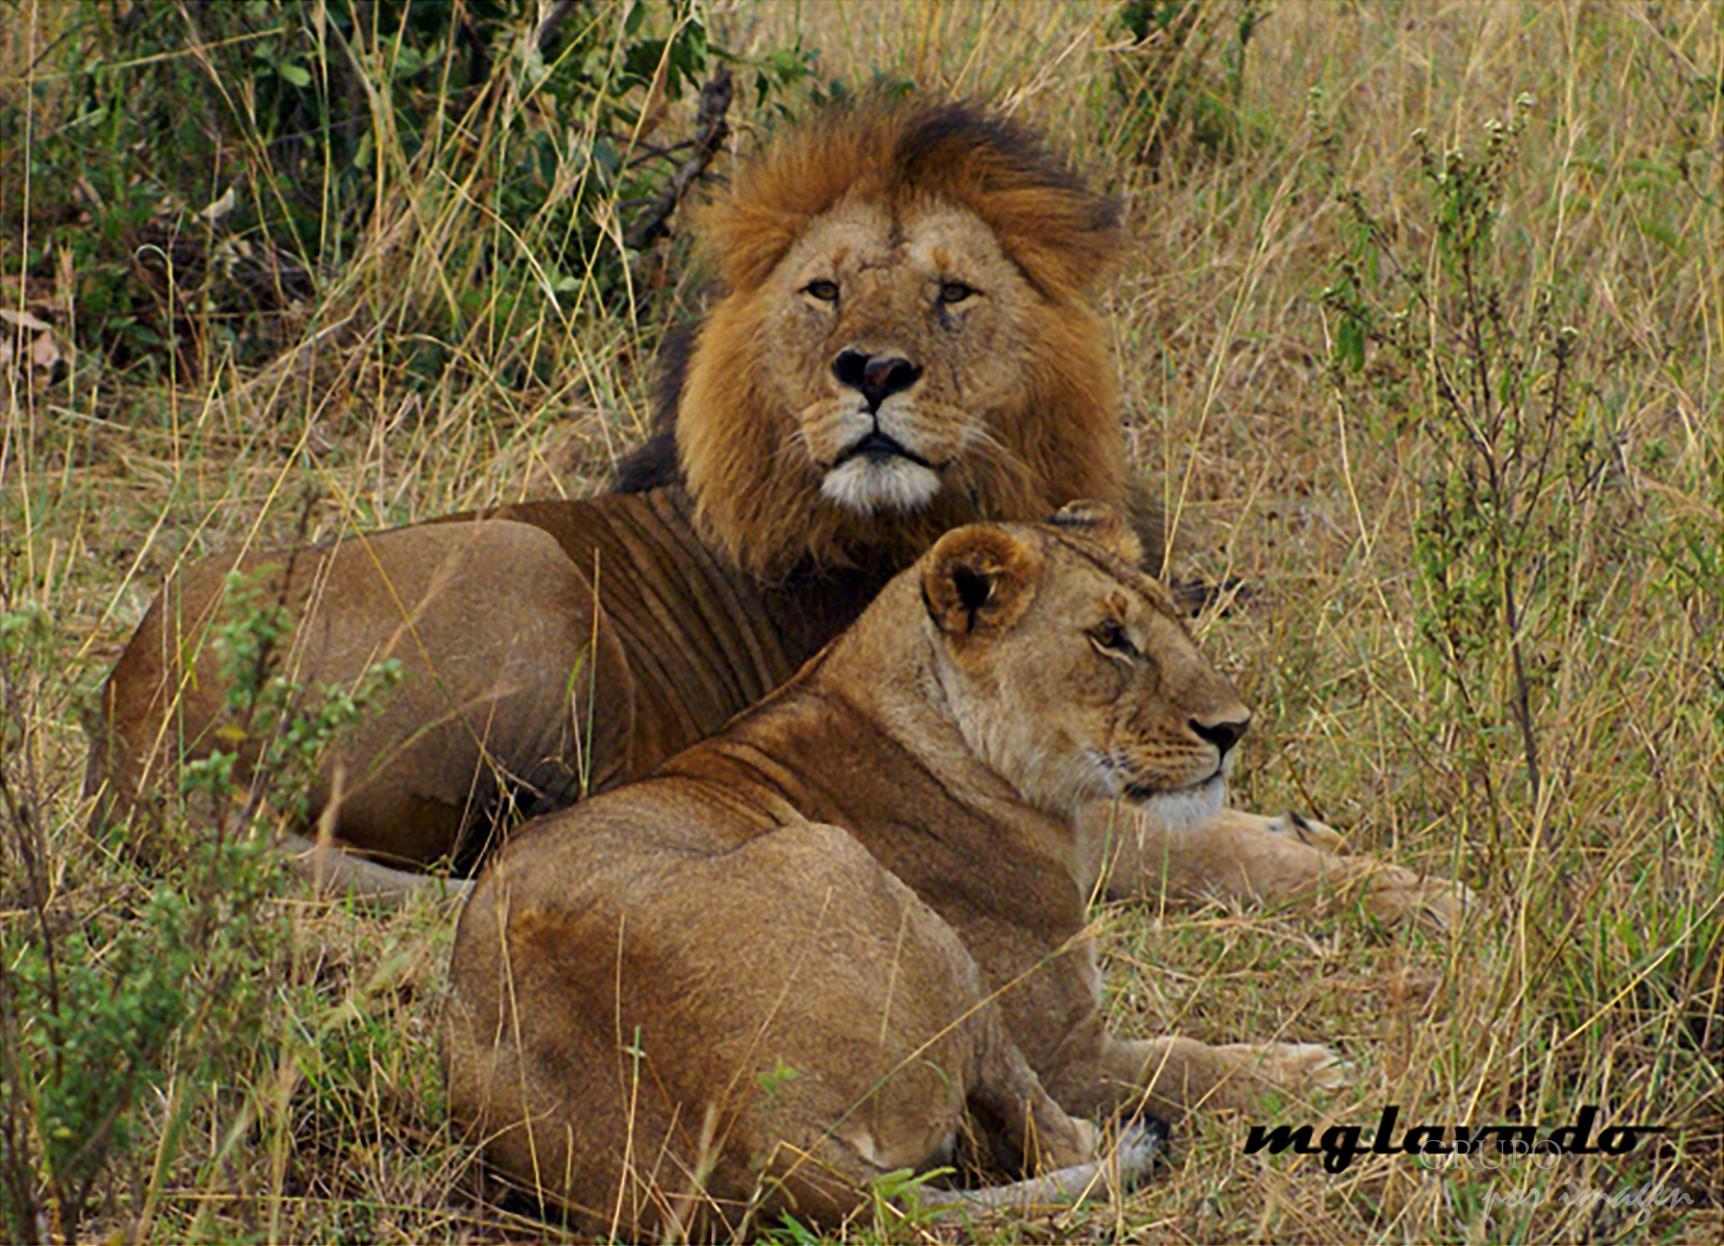 Reserva Nacional Massai Mara – Kenya / Graciela Lavado